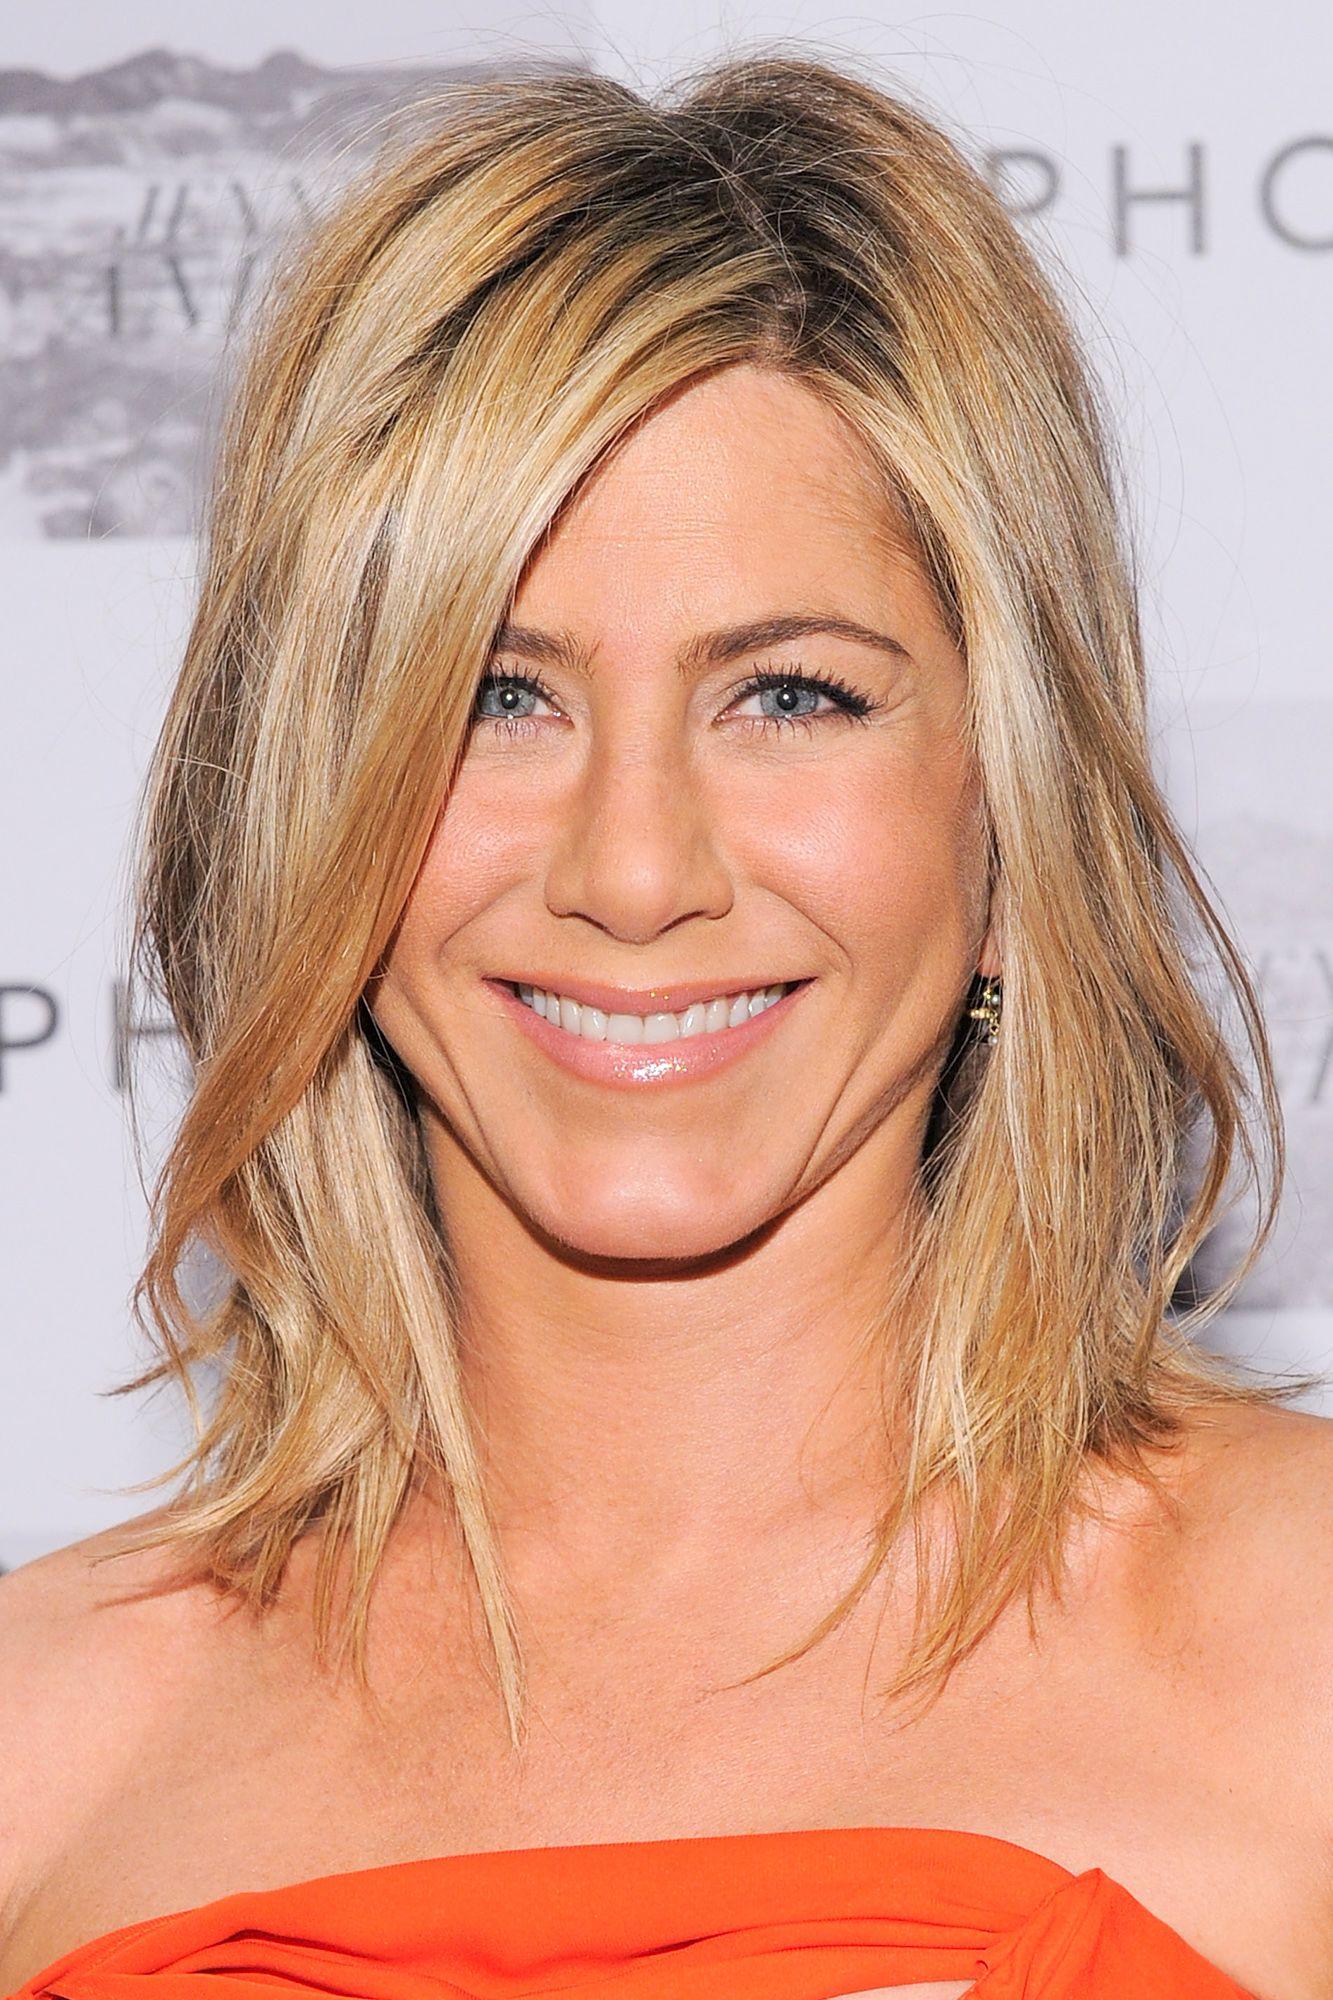 Jennifer Aniston S Best Hairstyles Of All Time 40 Jennifer Aniston